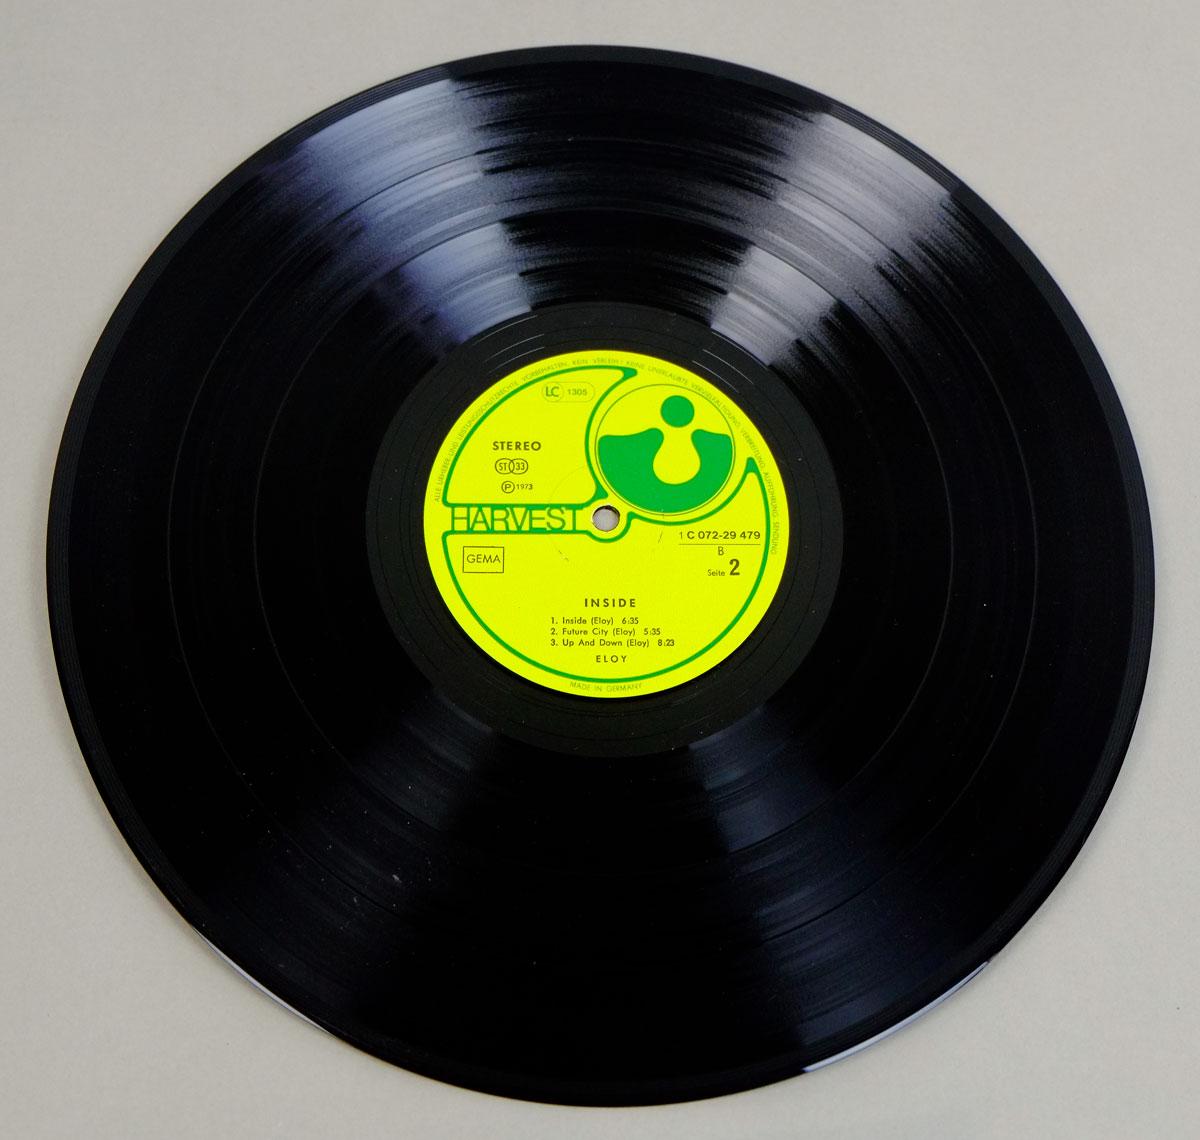 "ELOY INSIDE KRAUTROCK FOC GATEFOLD 12"" LP VINYL"